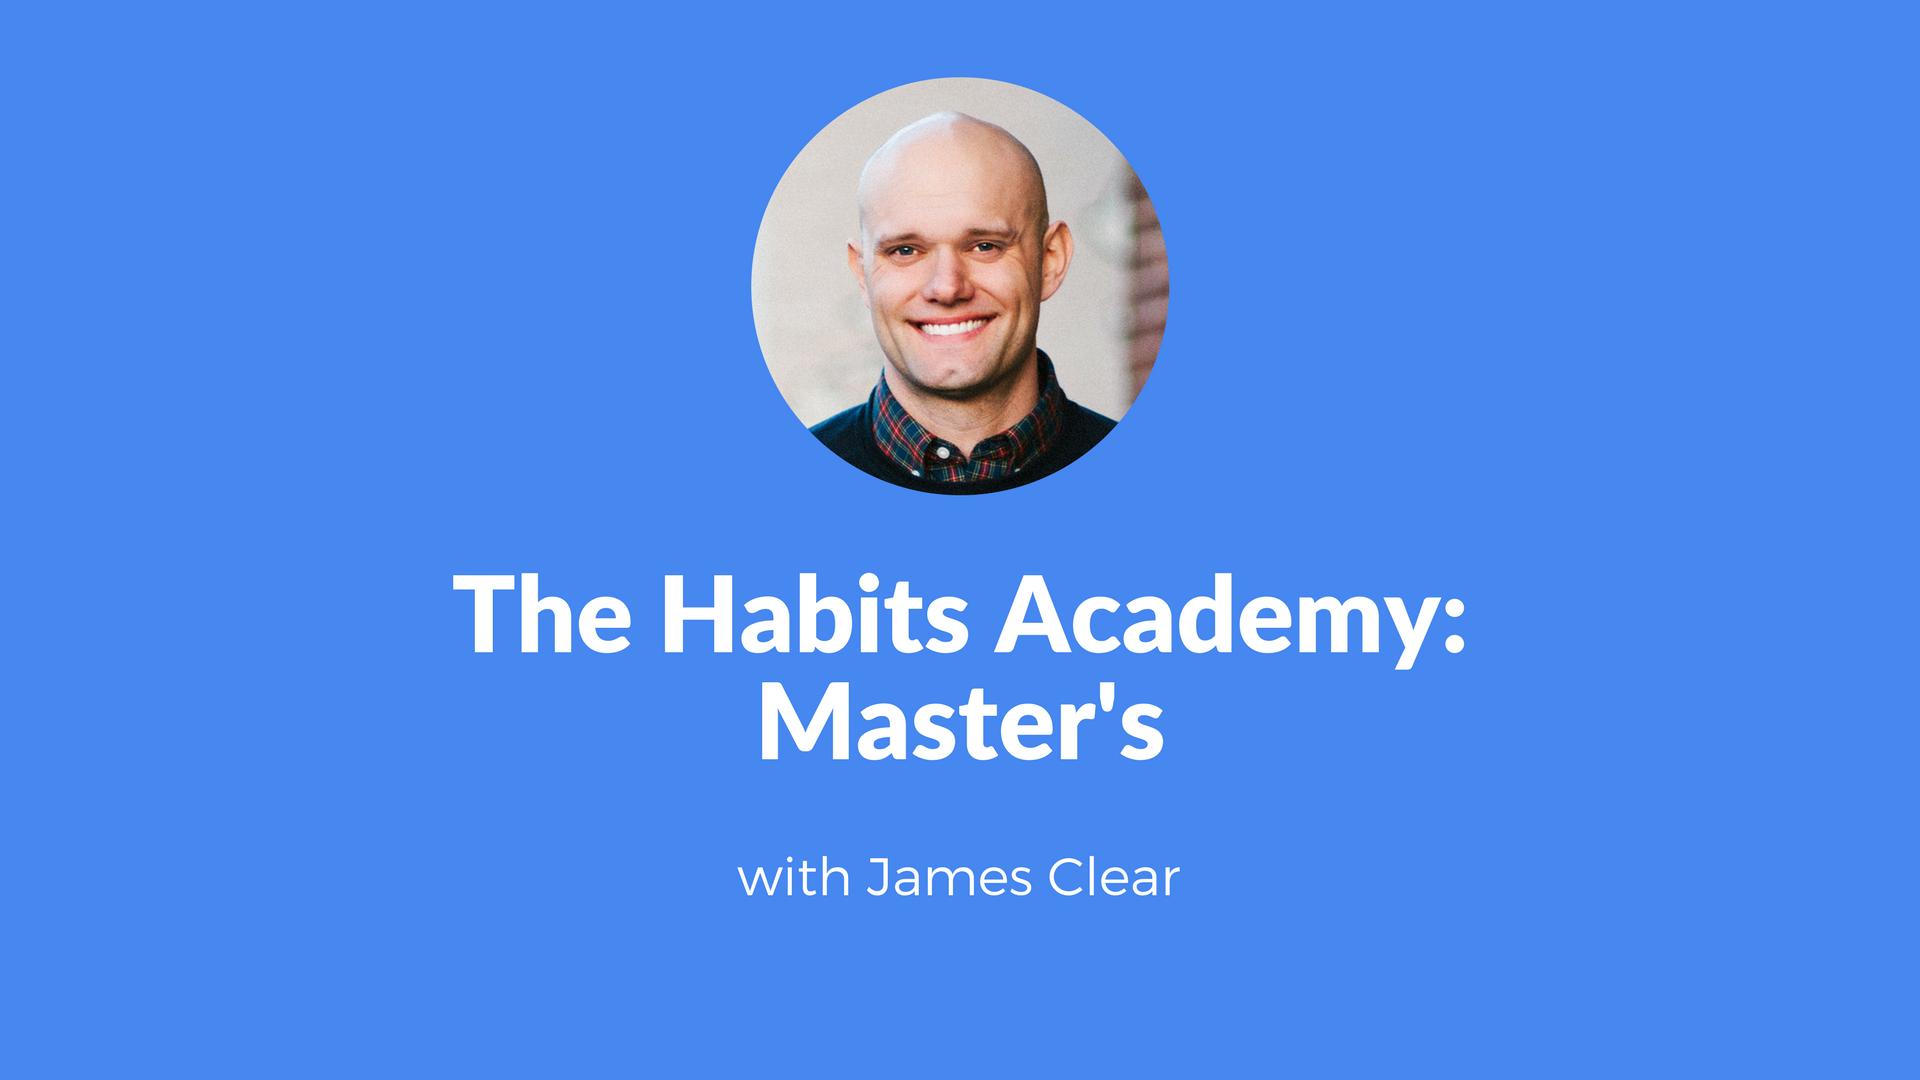 The Habits Academy: Master's